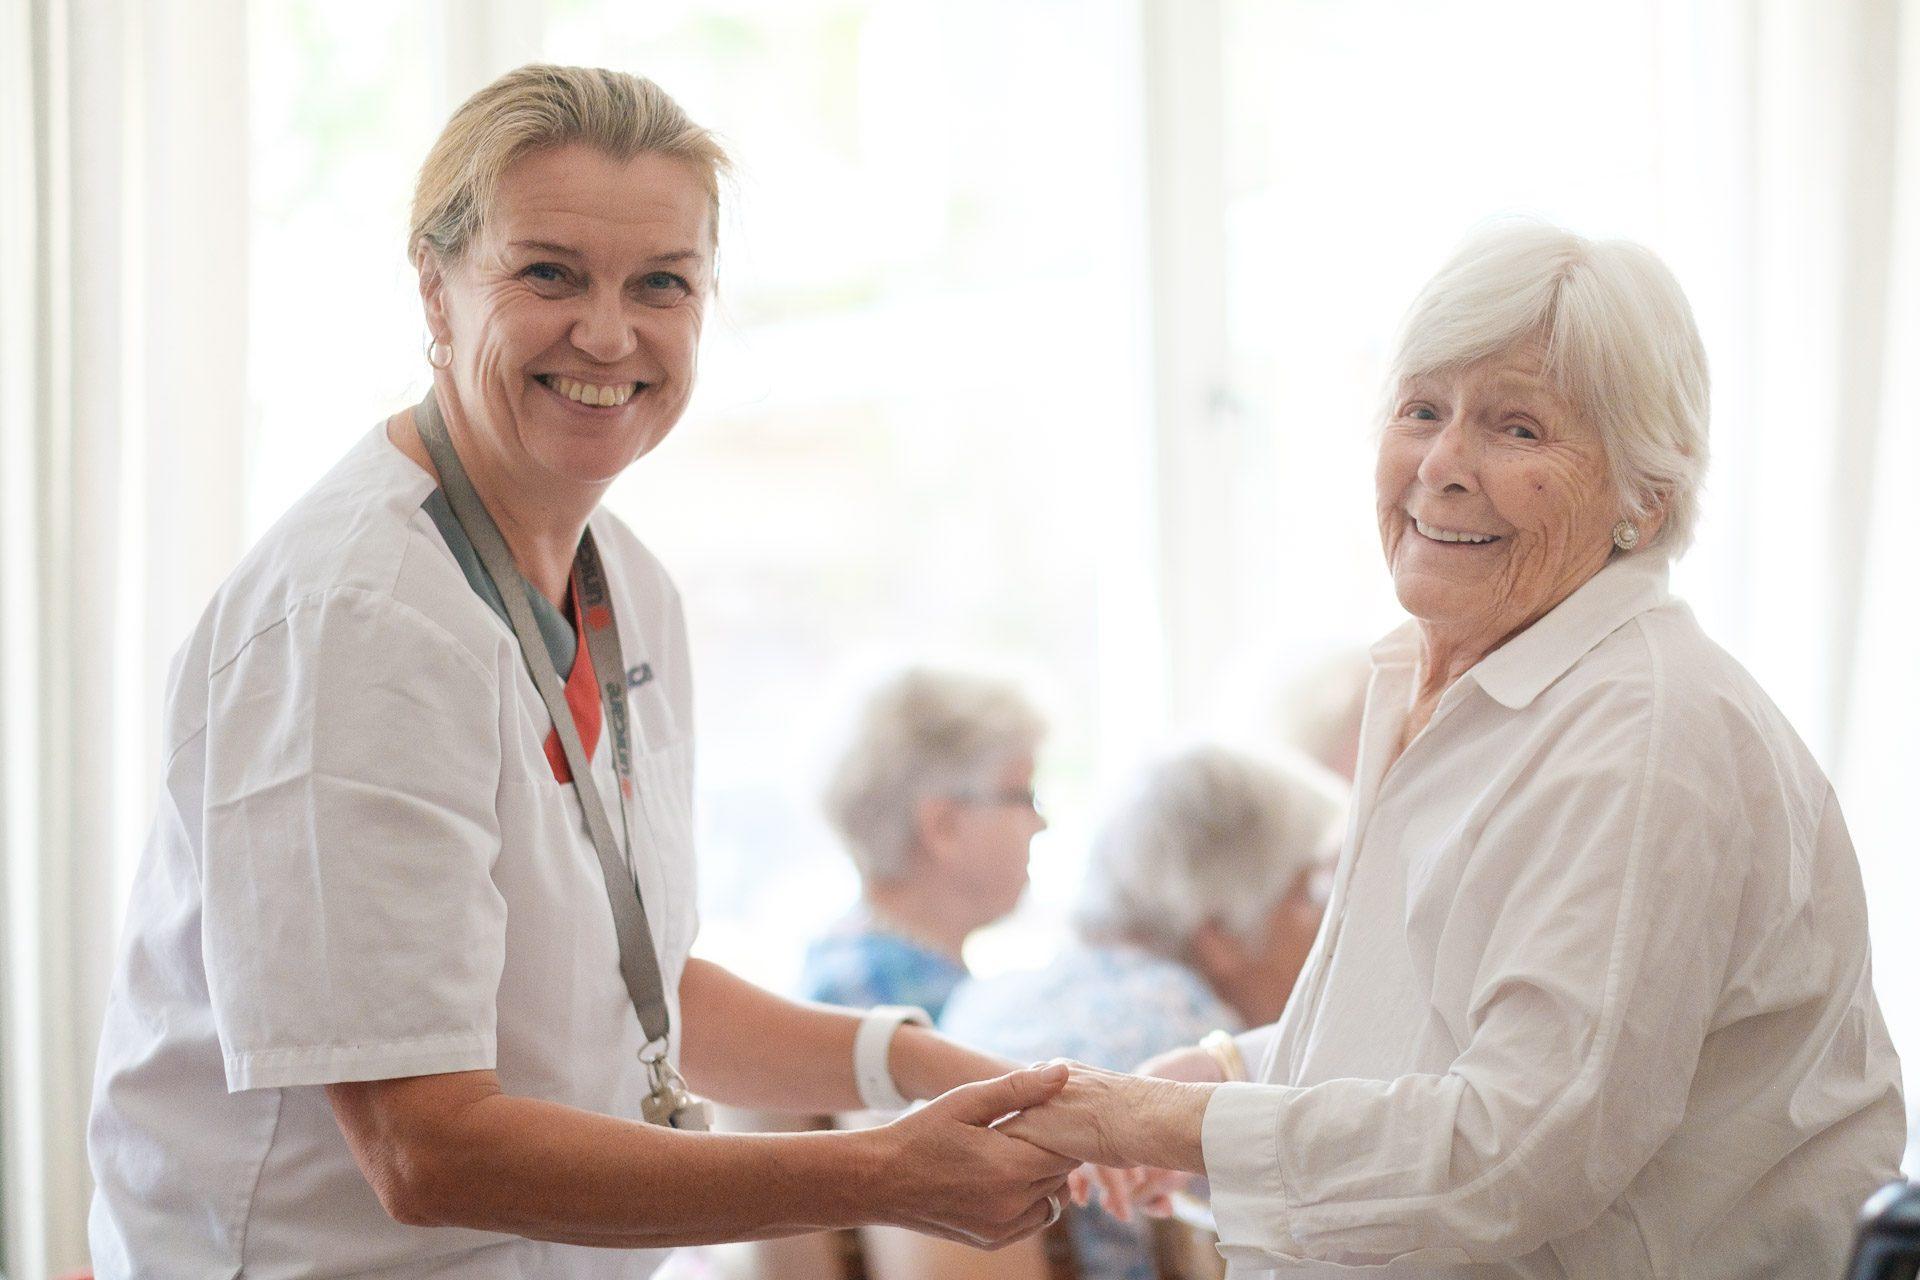 «SVs skremselspropaganda kan ramme pasientvelferden»